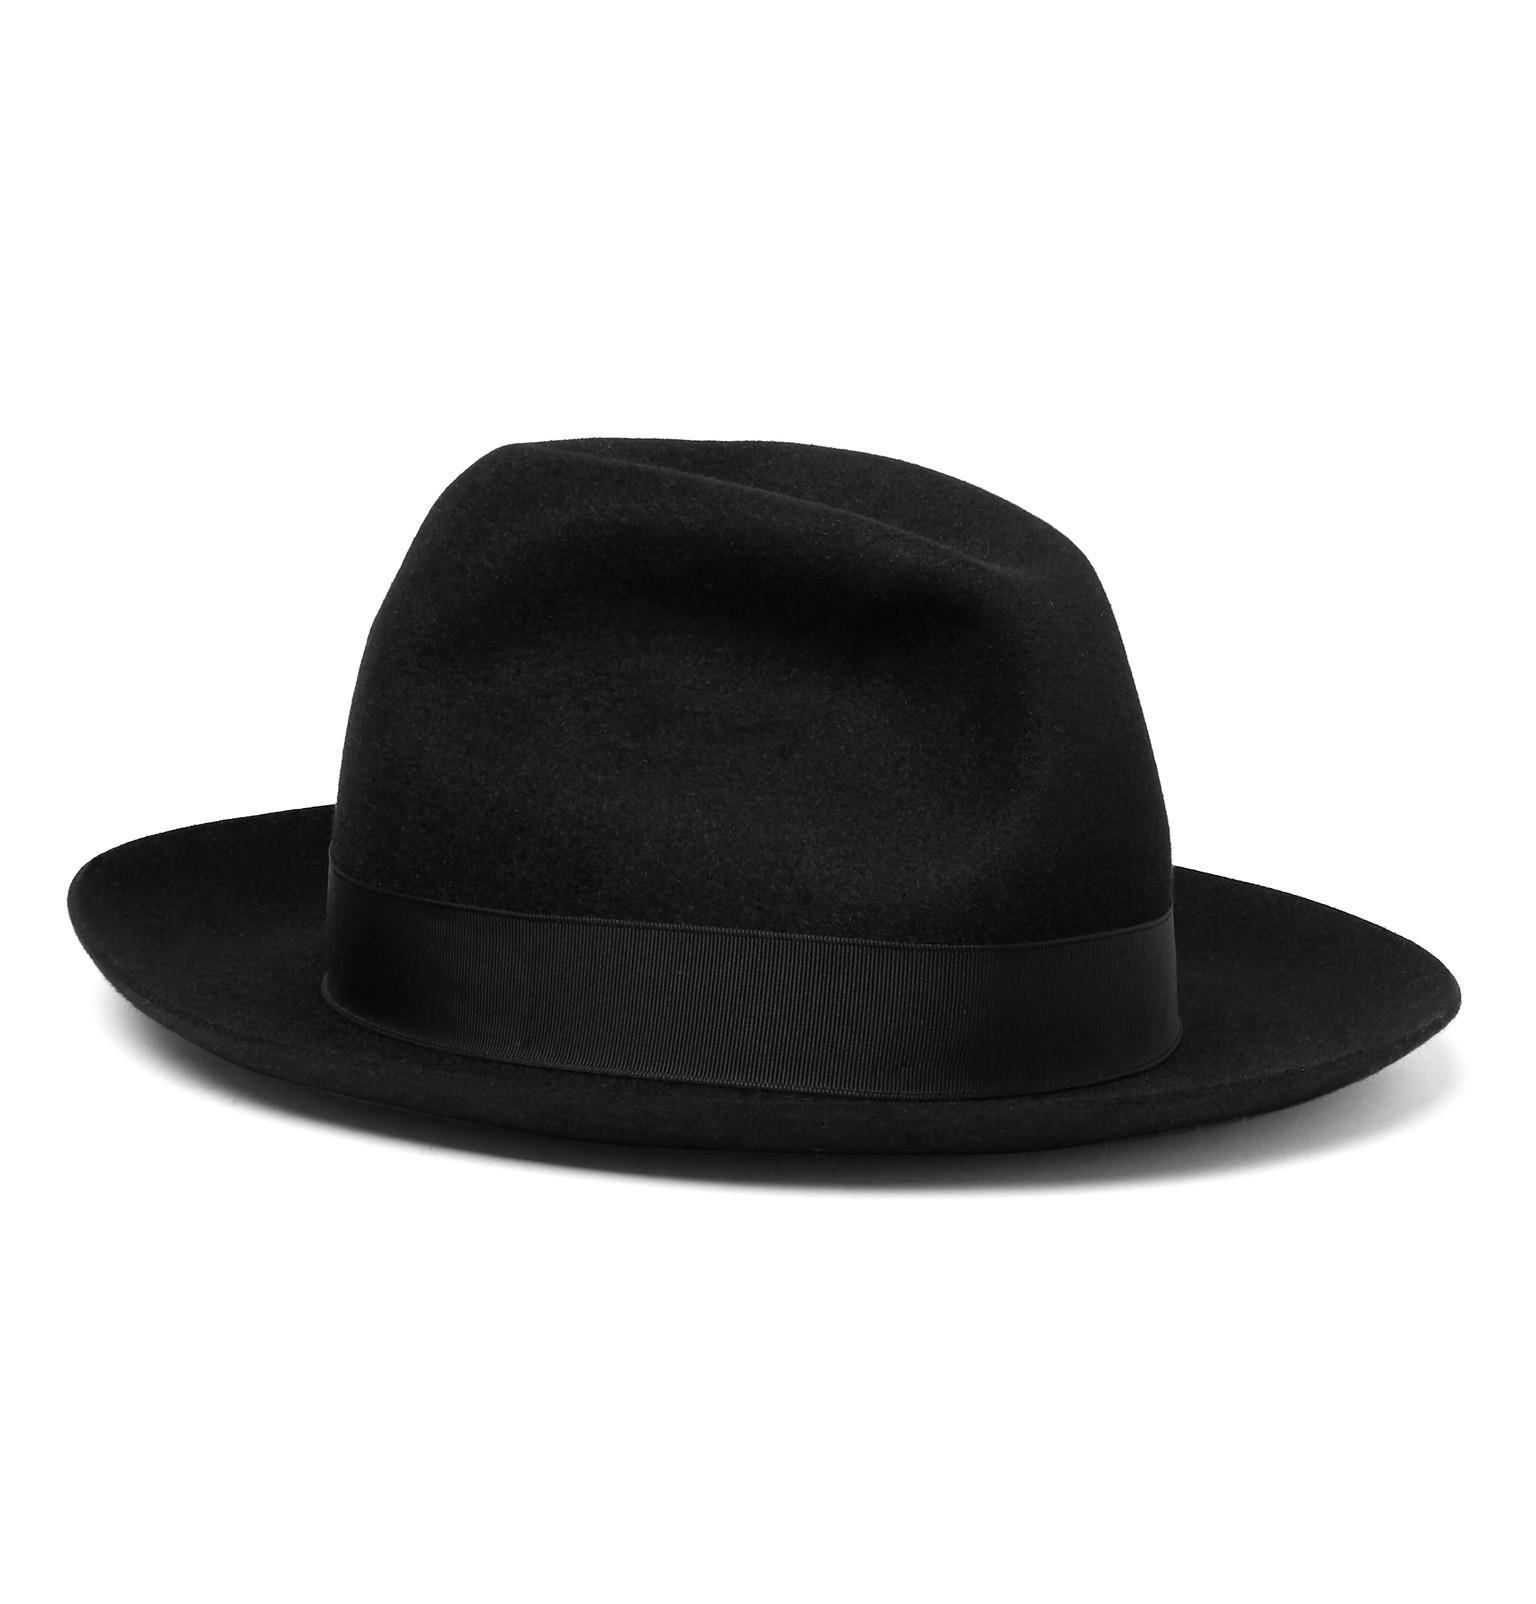 ab6815d82ea4fa Borsalino Marengo Grosgrain-trimmed Rabbit-felt Fedora in Black for ...